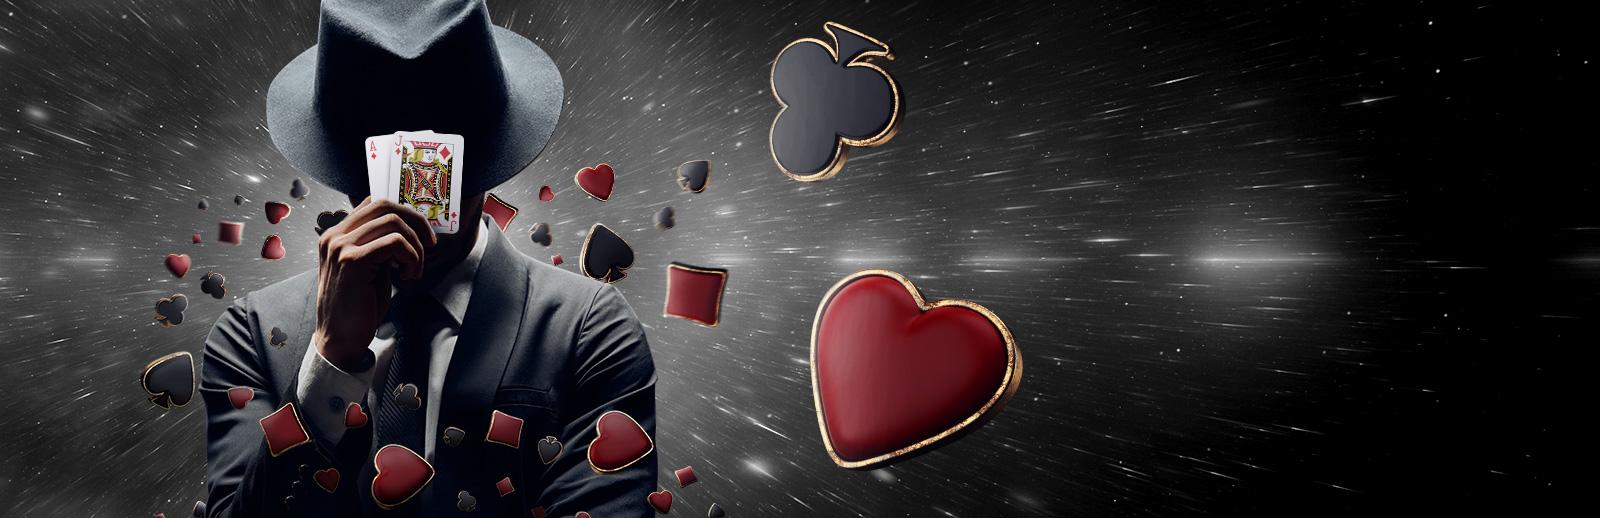 29 Ianuarie - 02 Februarie 2020,  Players' Poker Club Cluj-Napoca